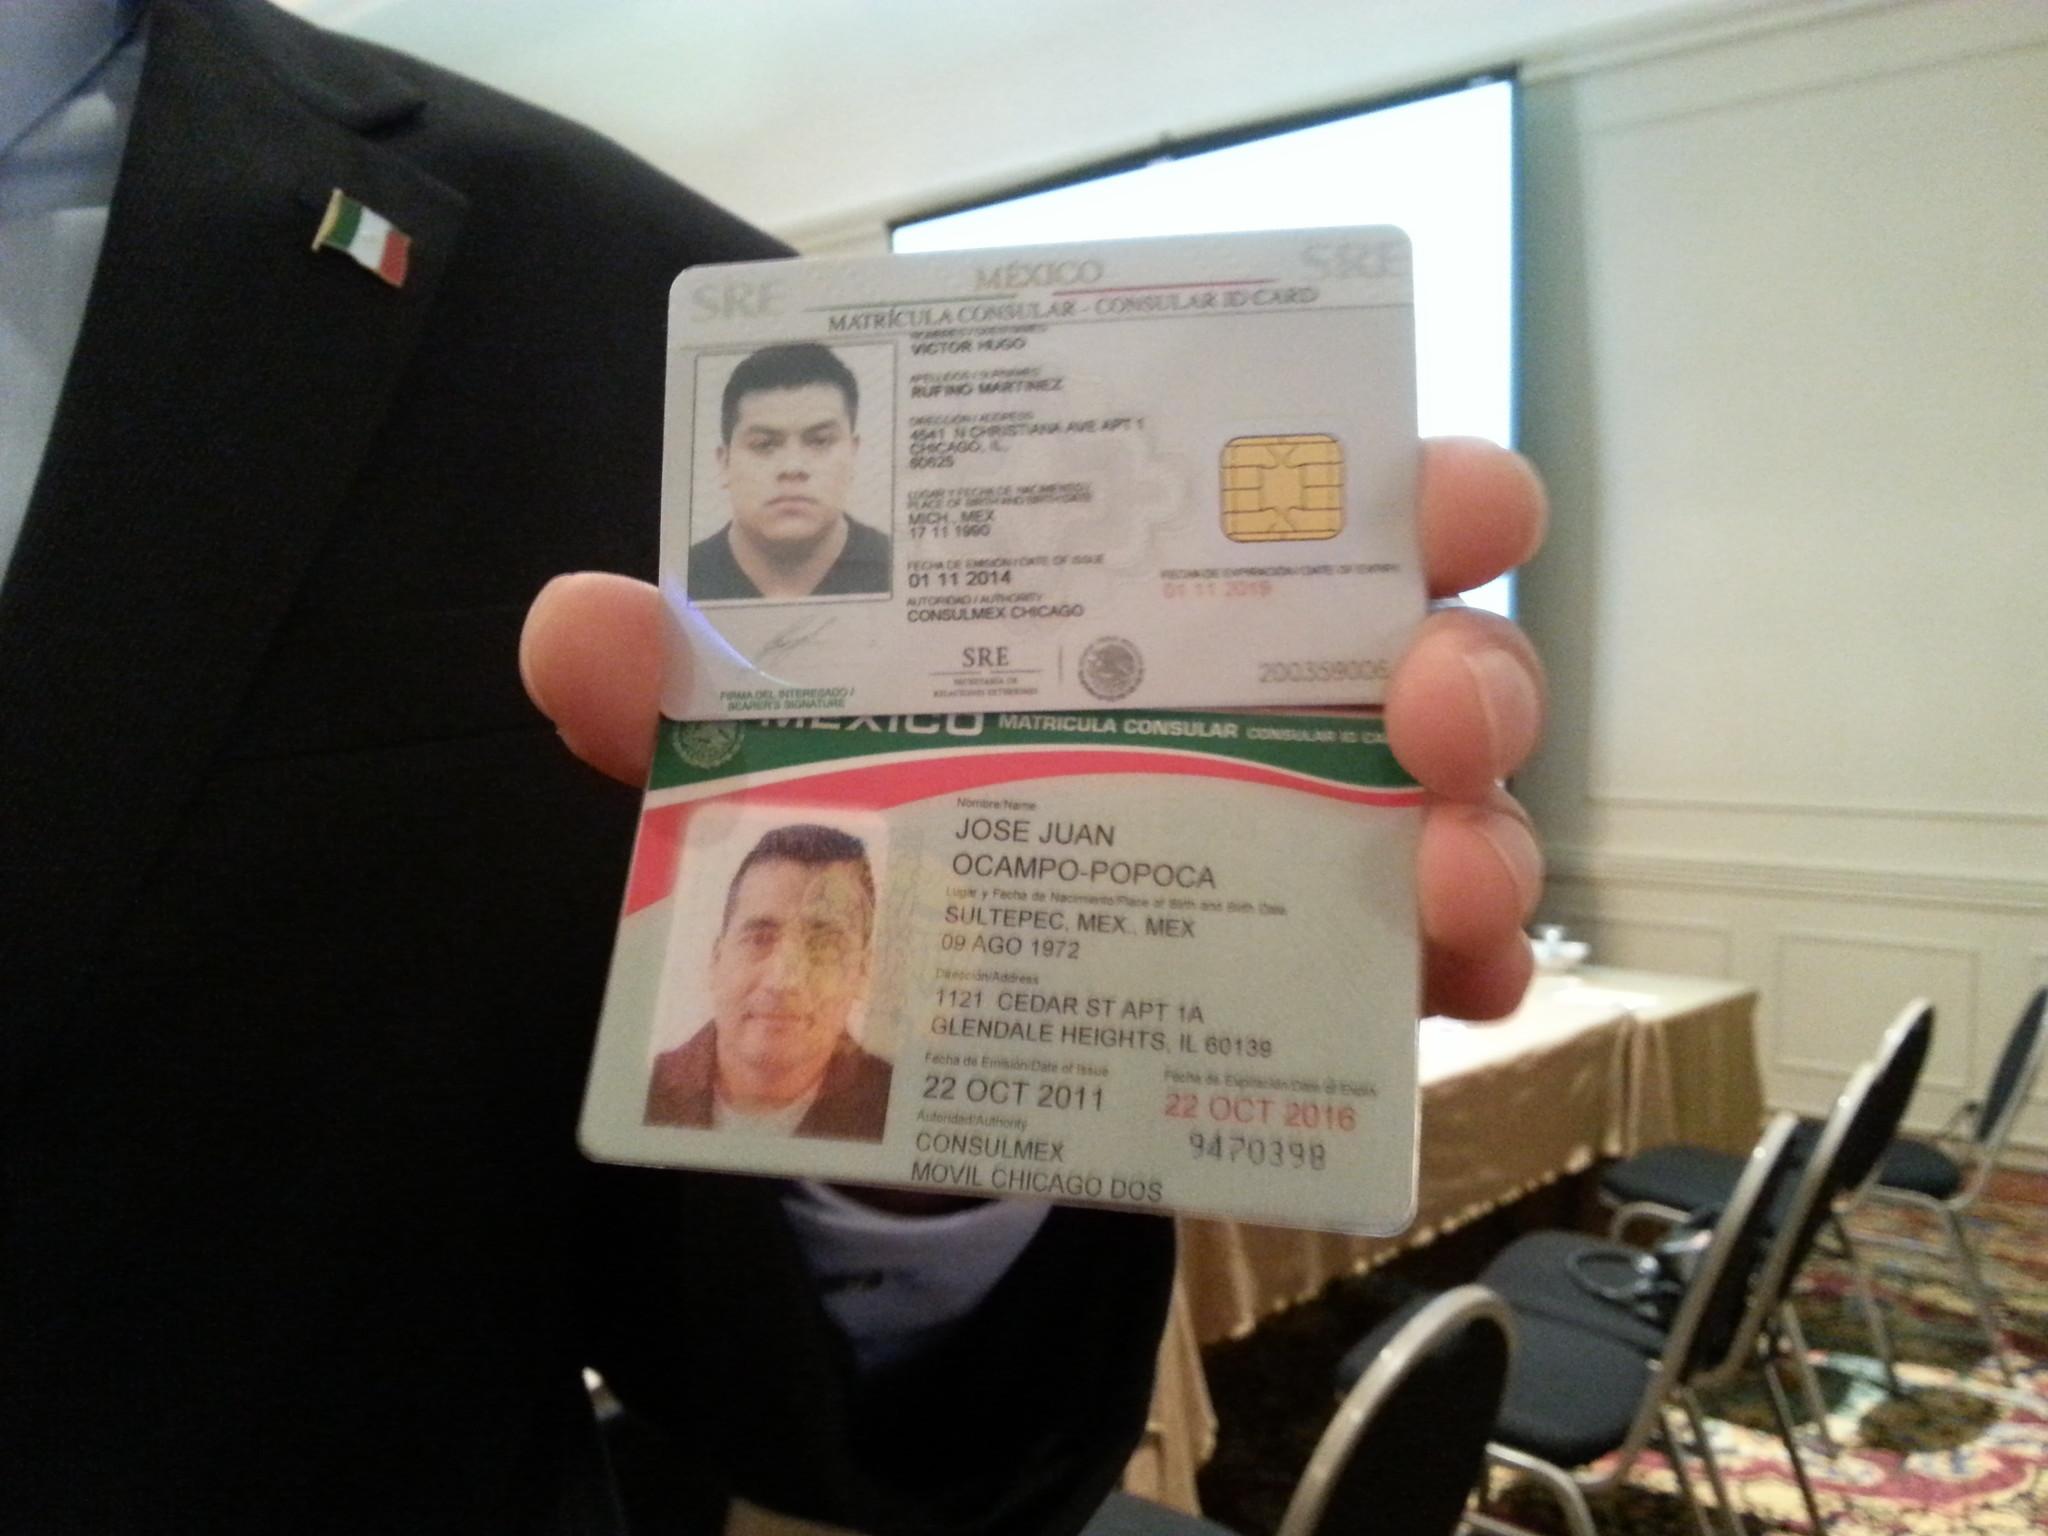 Presentan matr cula consular mexicana mejorada hoy chicago - Matricula coche hoy ...